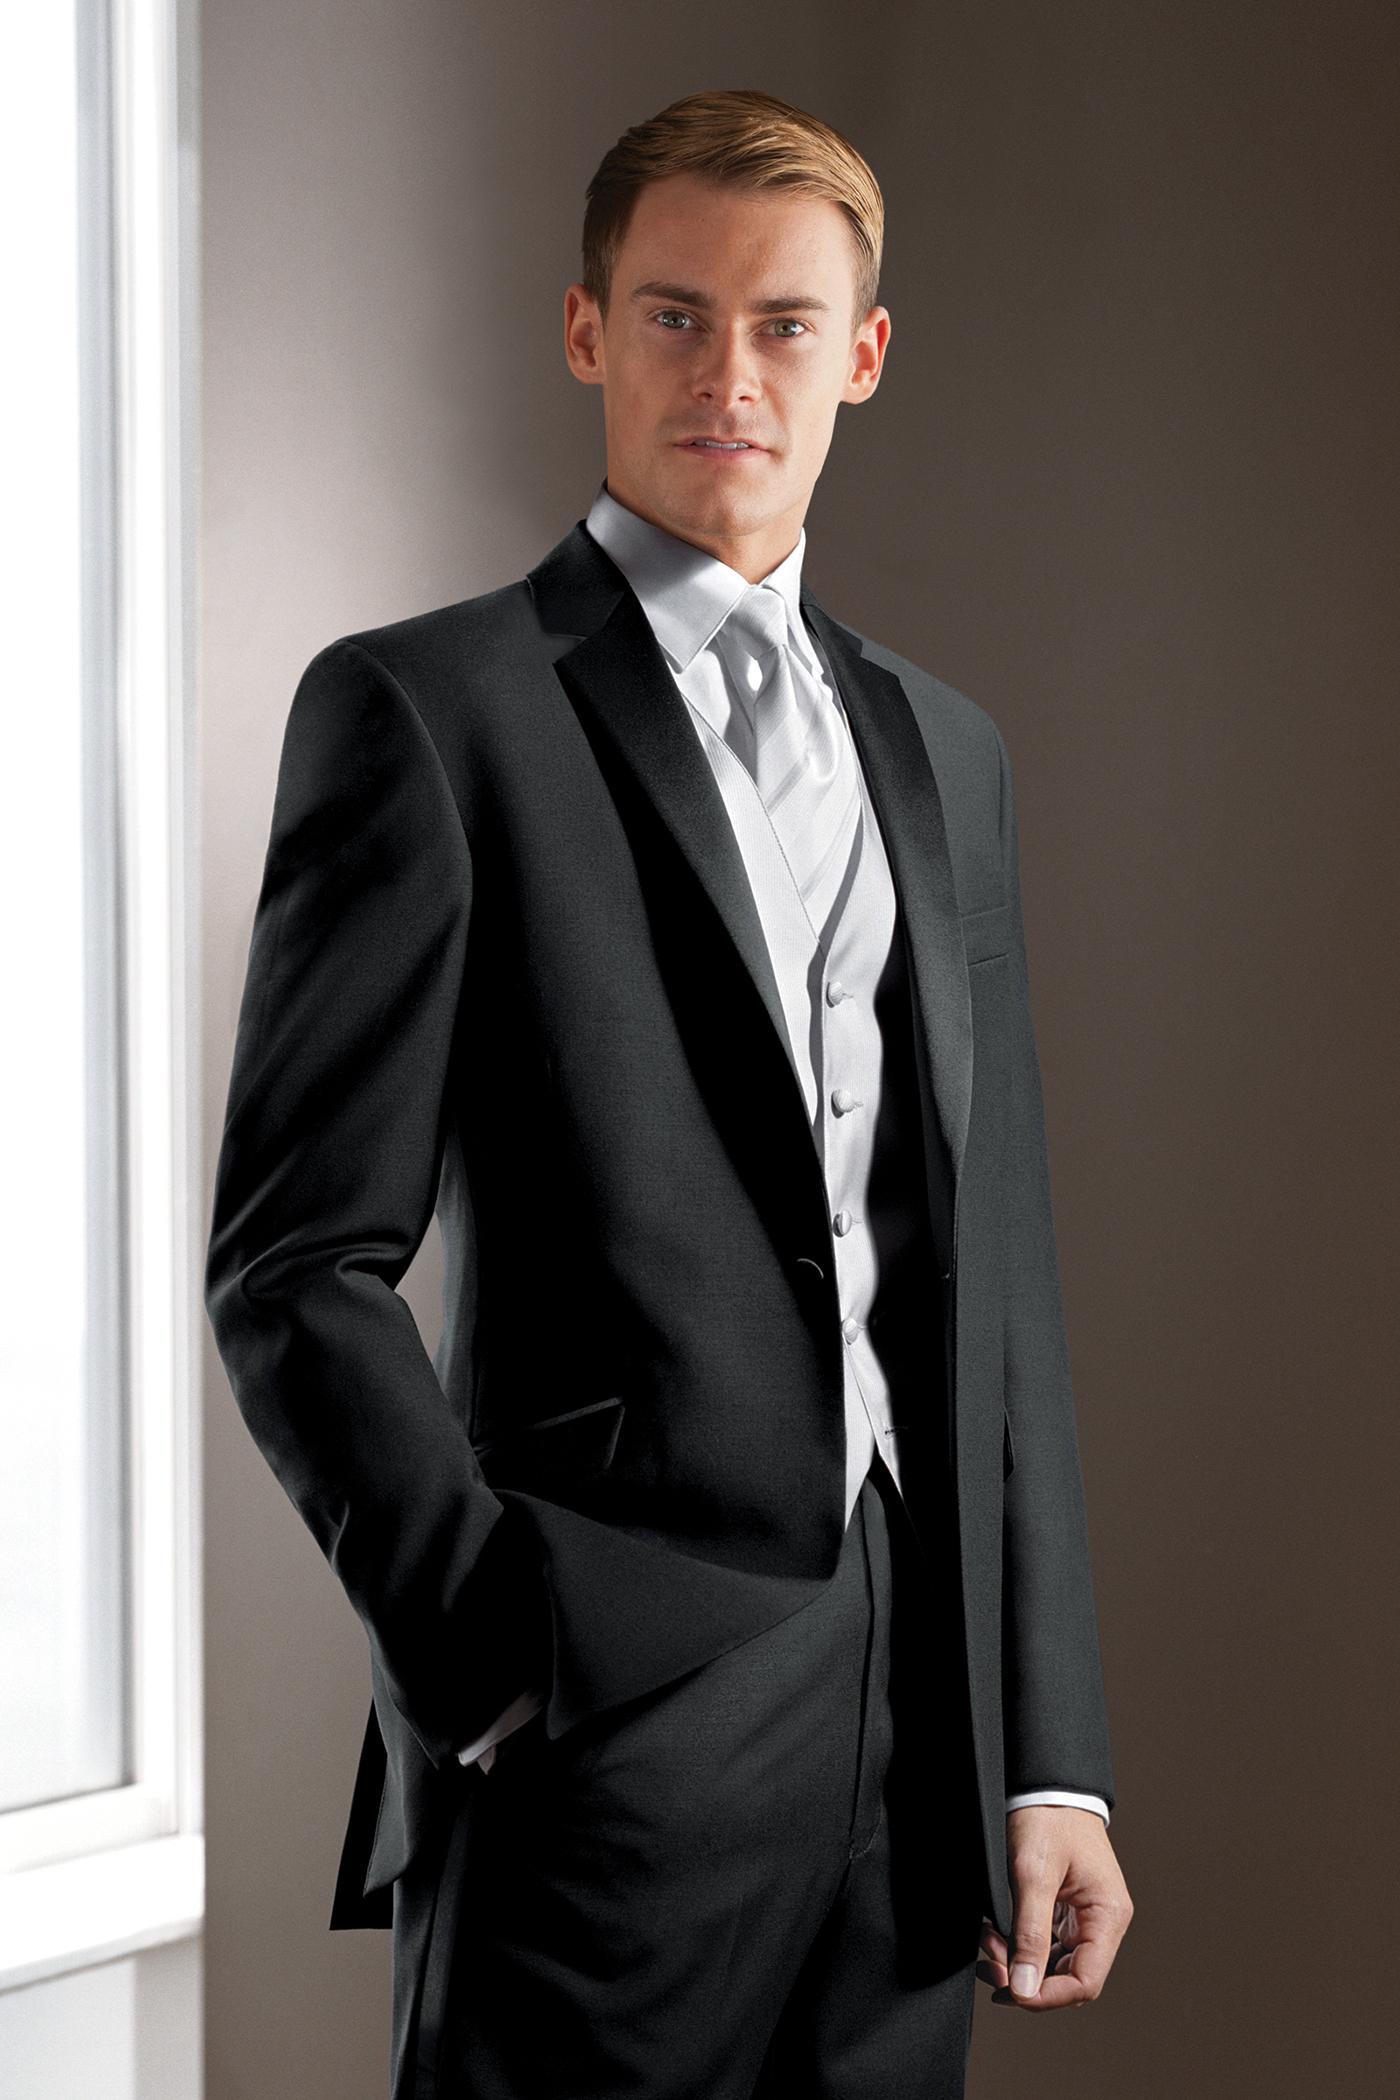 2015 Black Wedding Suits For Men Tuxedos Notched Lapel Best Mens One Button Groomsmen Three Piece Suit Jacket Pants Vest TieU1 Guys Prom